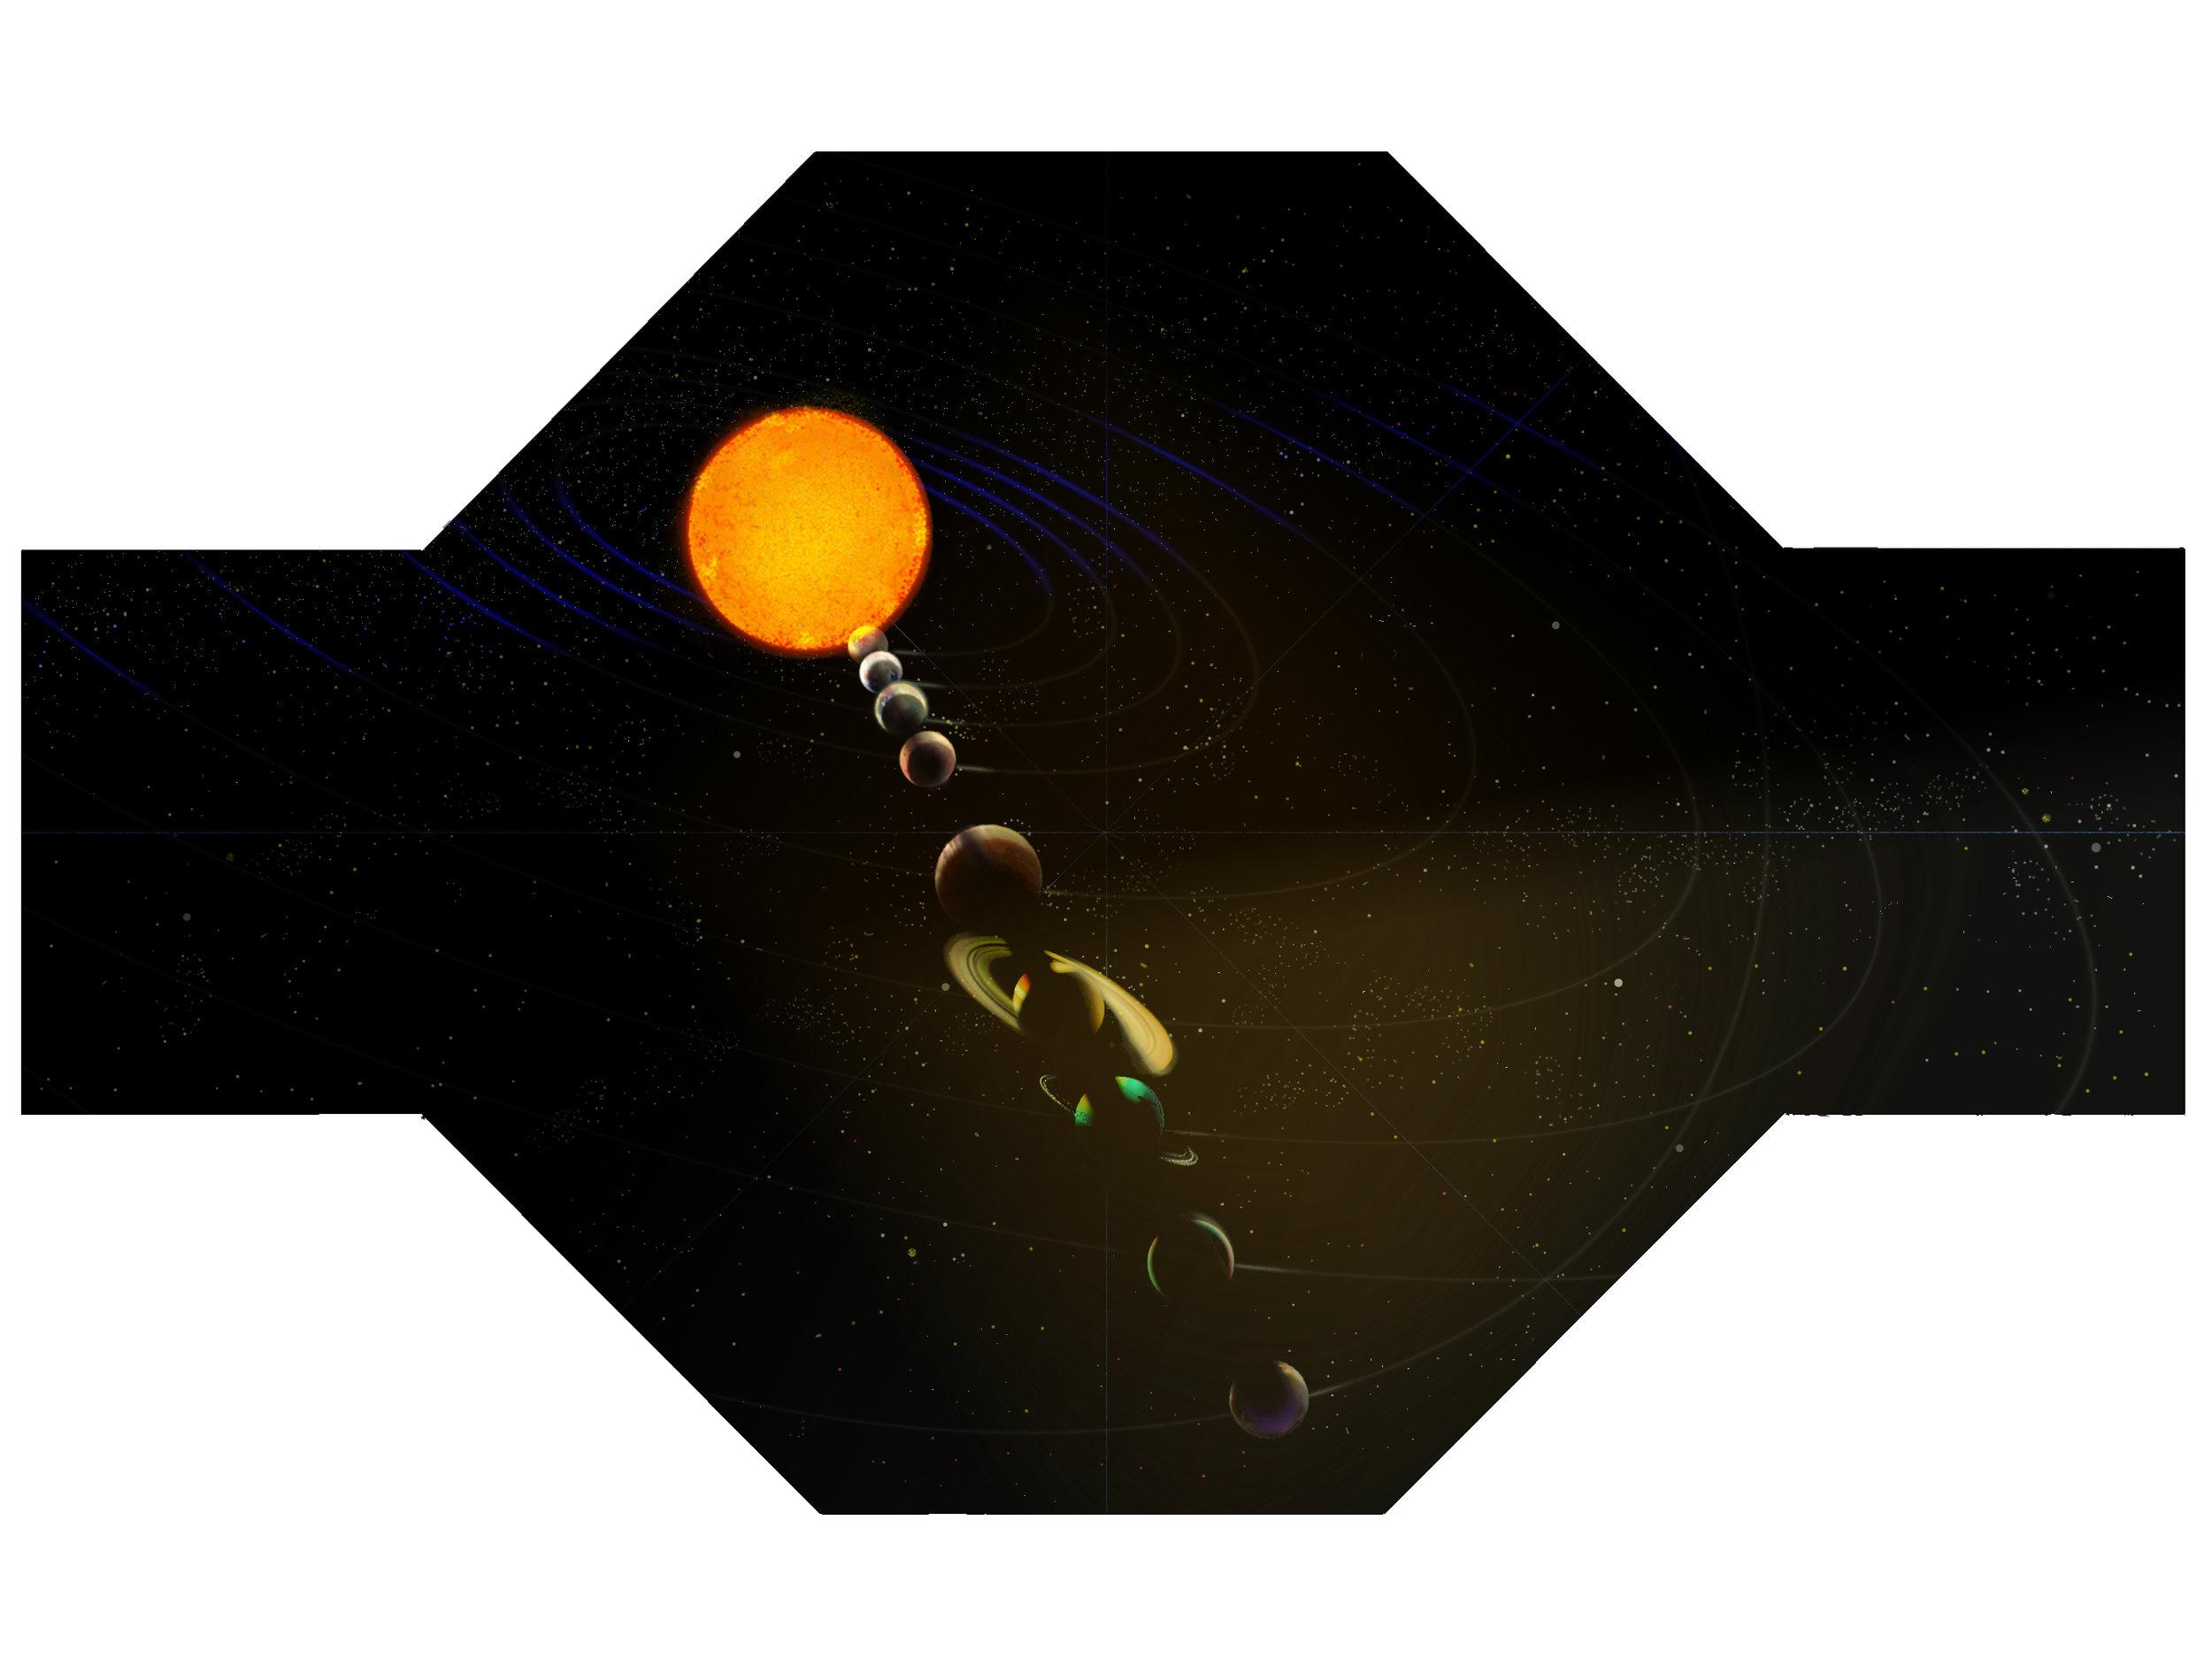 CaseStudySpheres_16.jpg